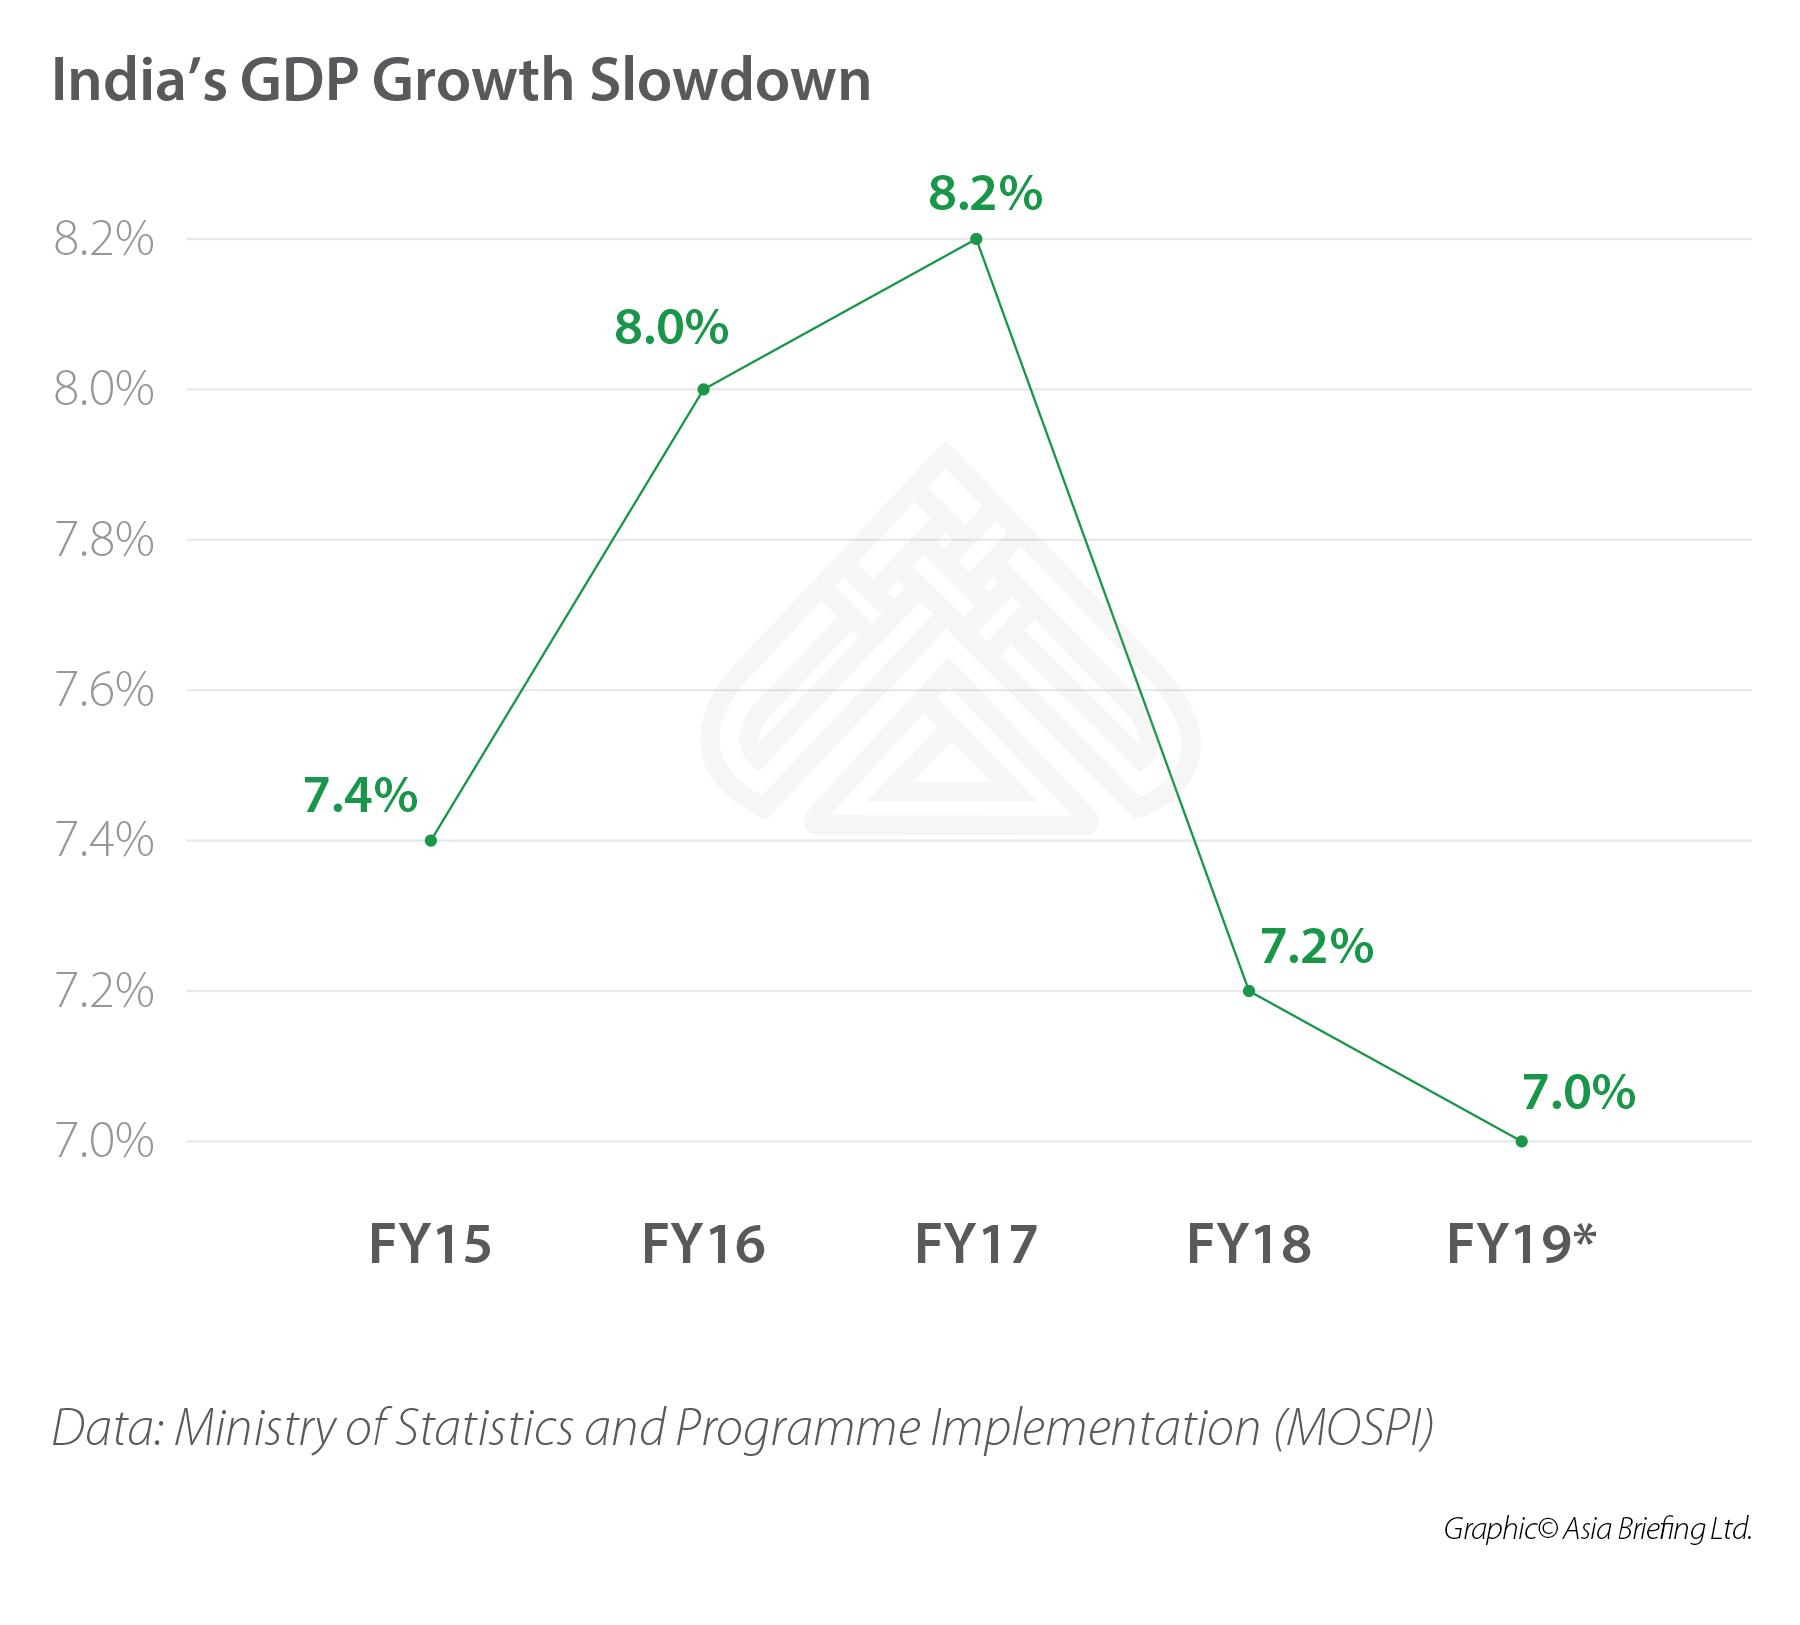 India's GDP slowdown